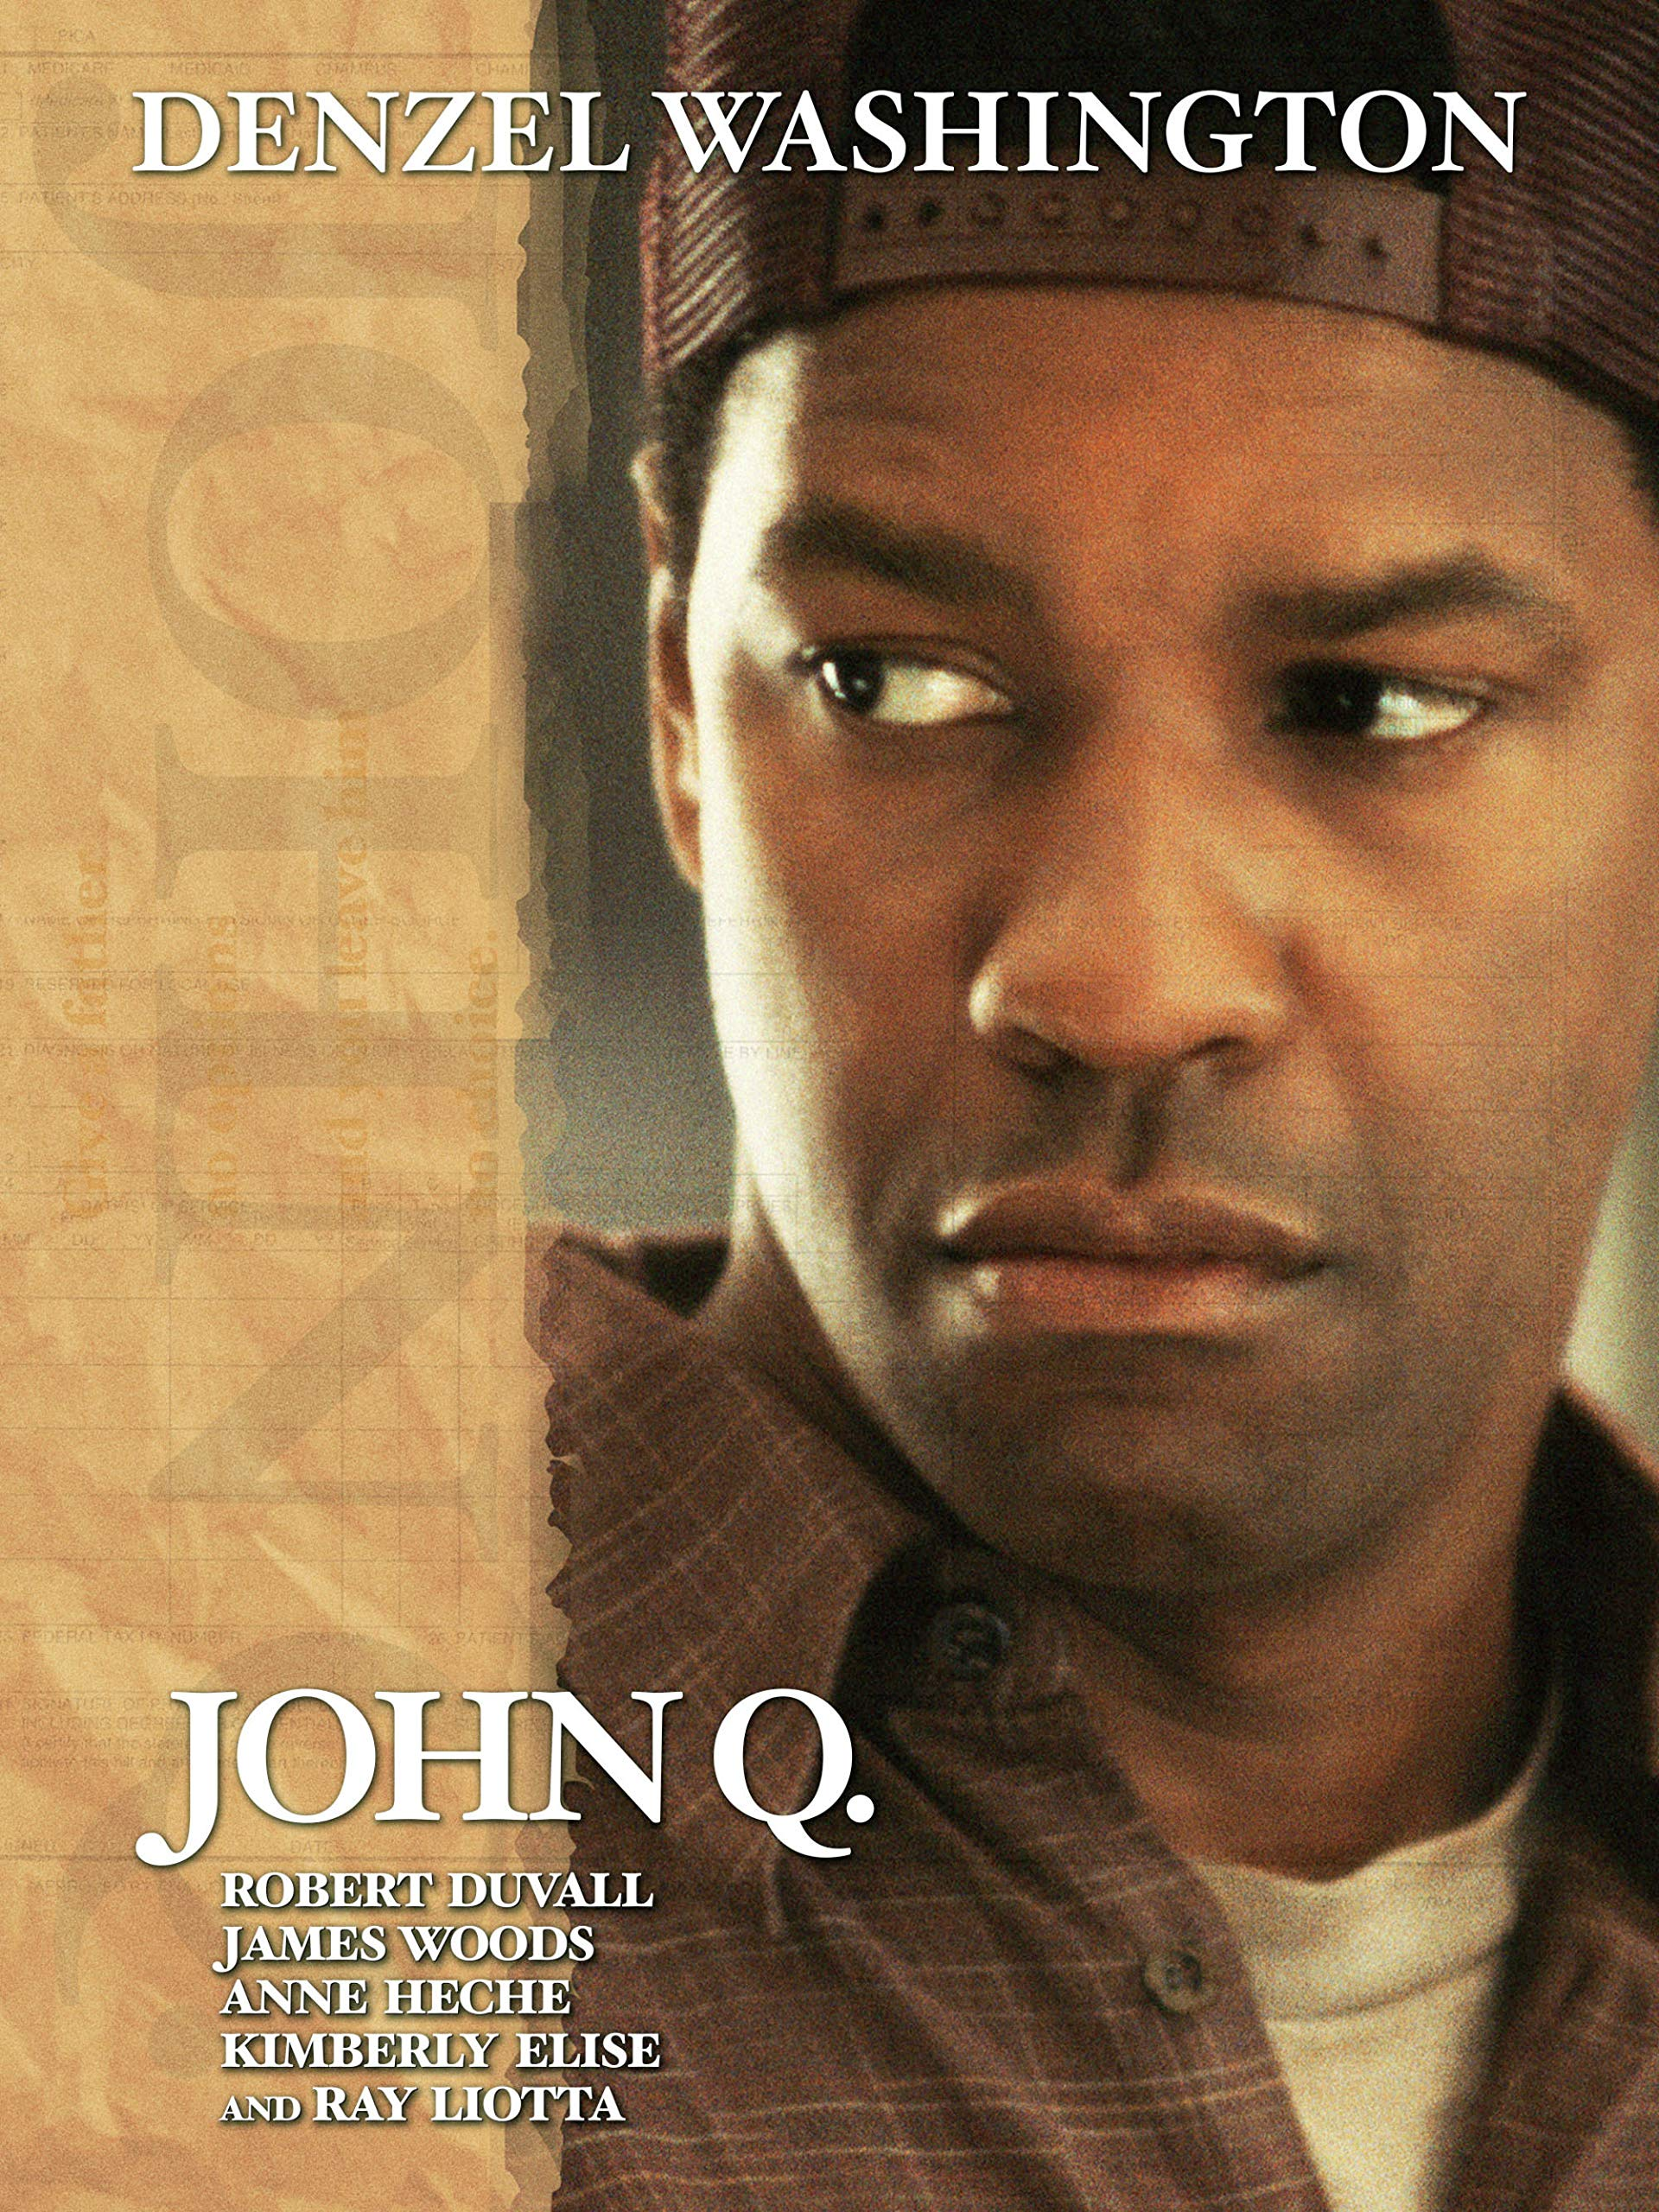 Watch John Q Prime Video